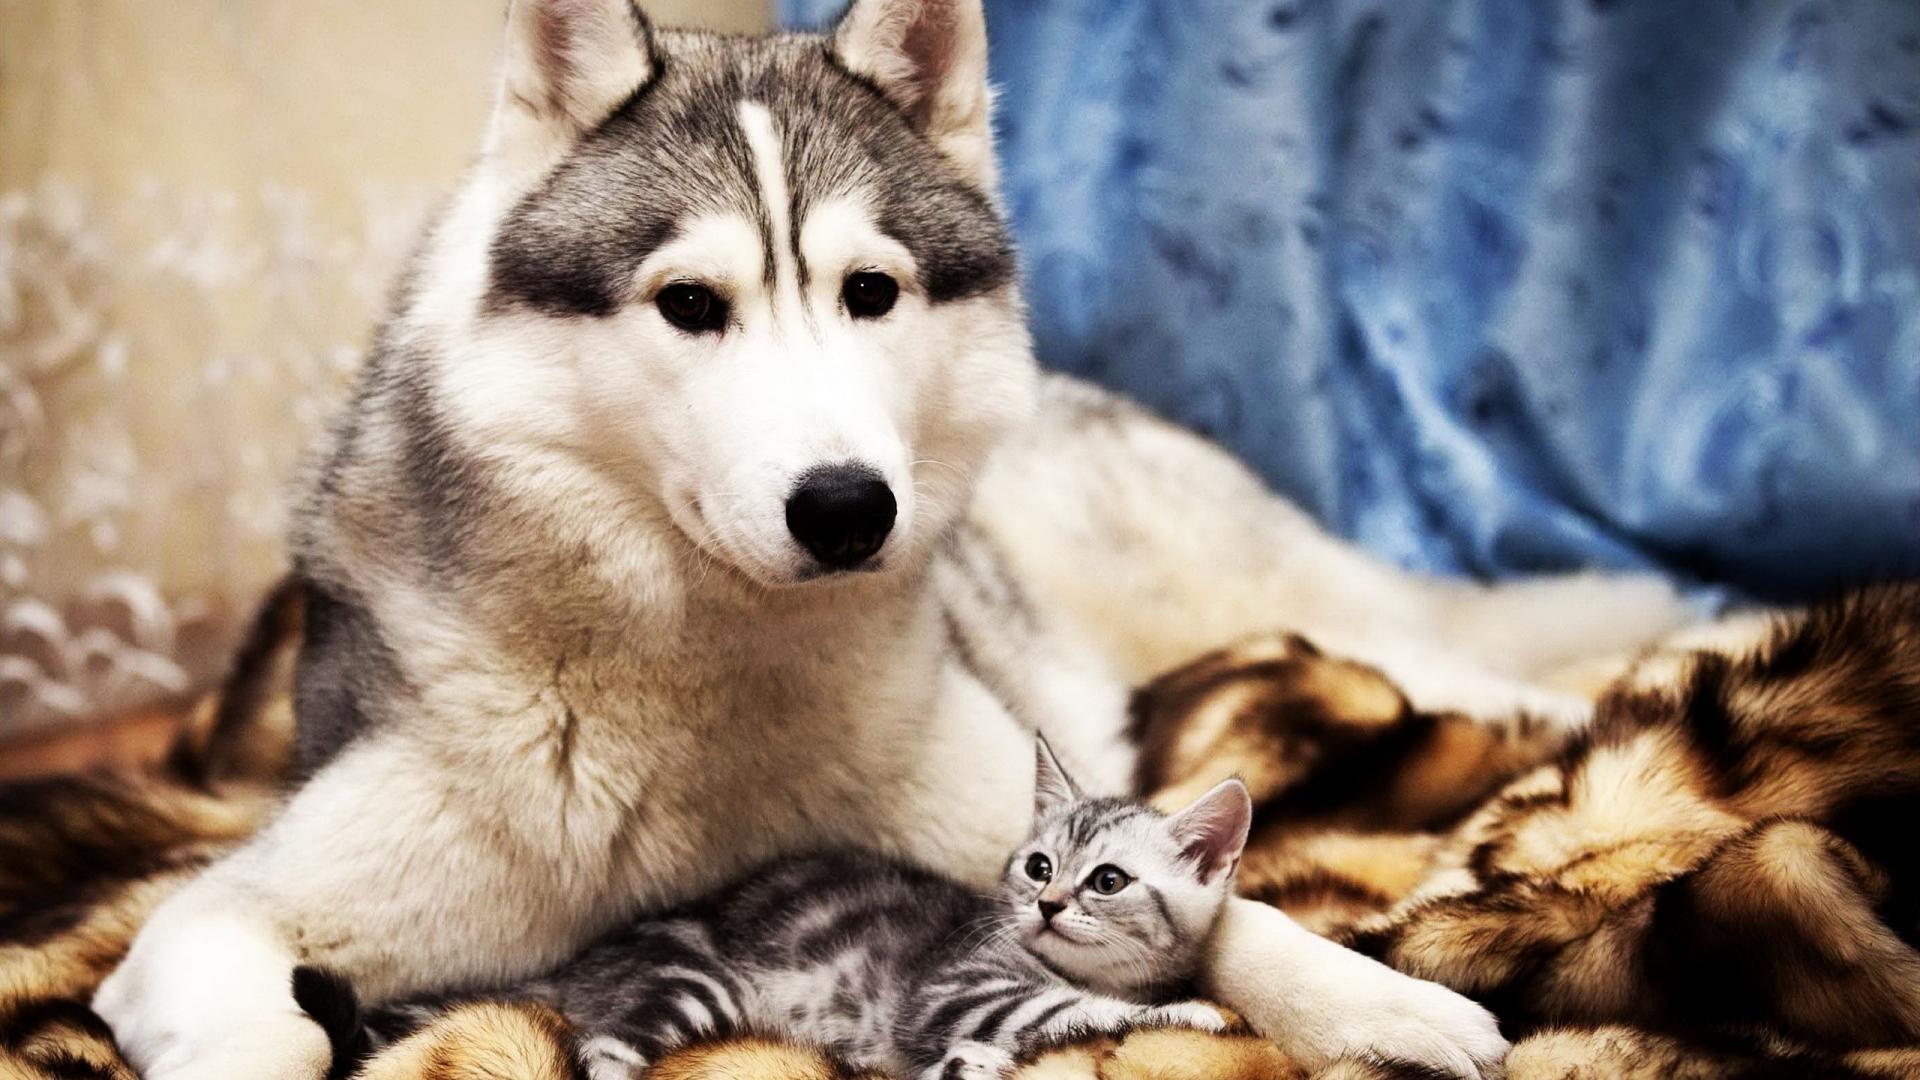 Desktop Backgrounds Cute Animals | Desktop Image